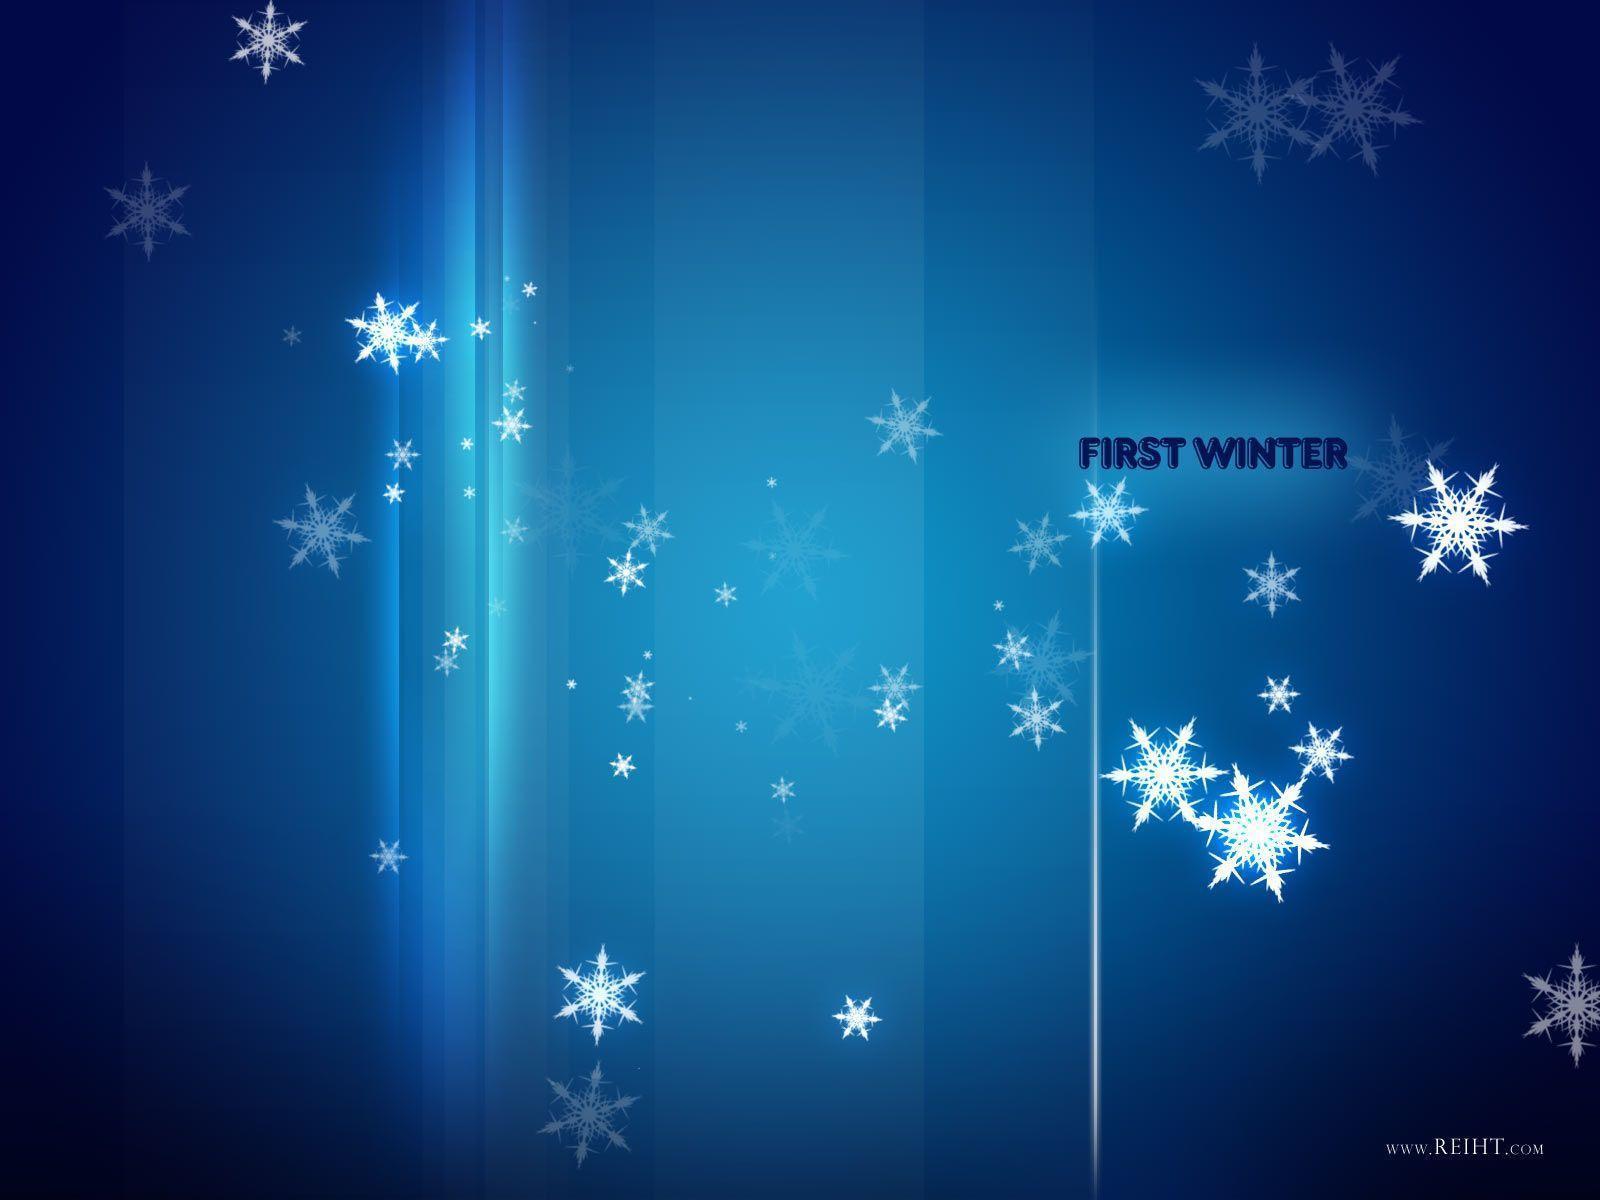 winter themed backgrounds wallpaper cave. Black Bedroom Furniture Sets. Home Design Ideas